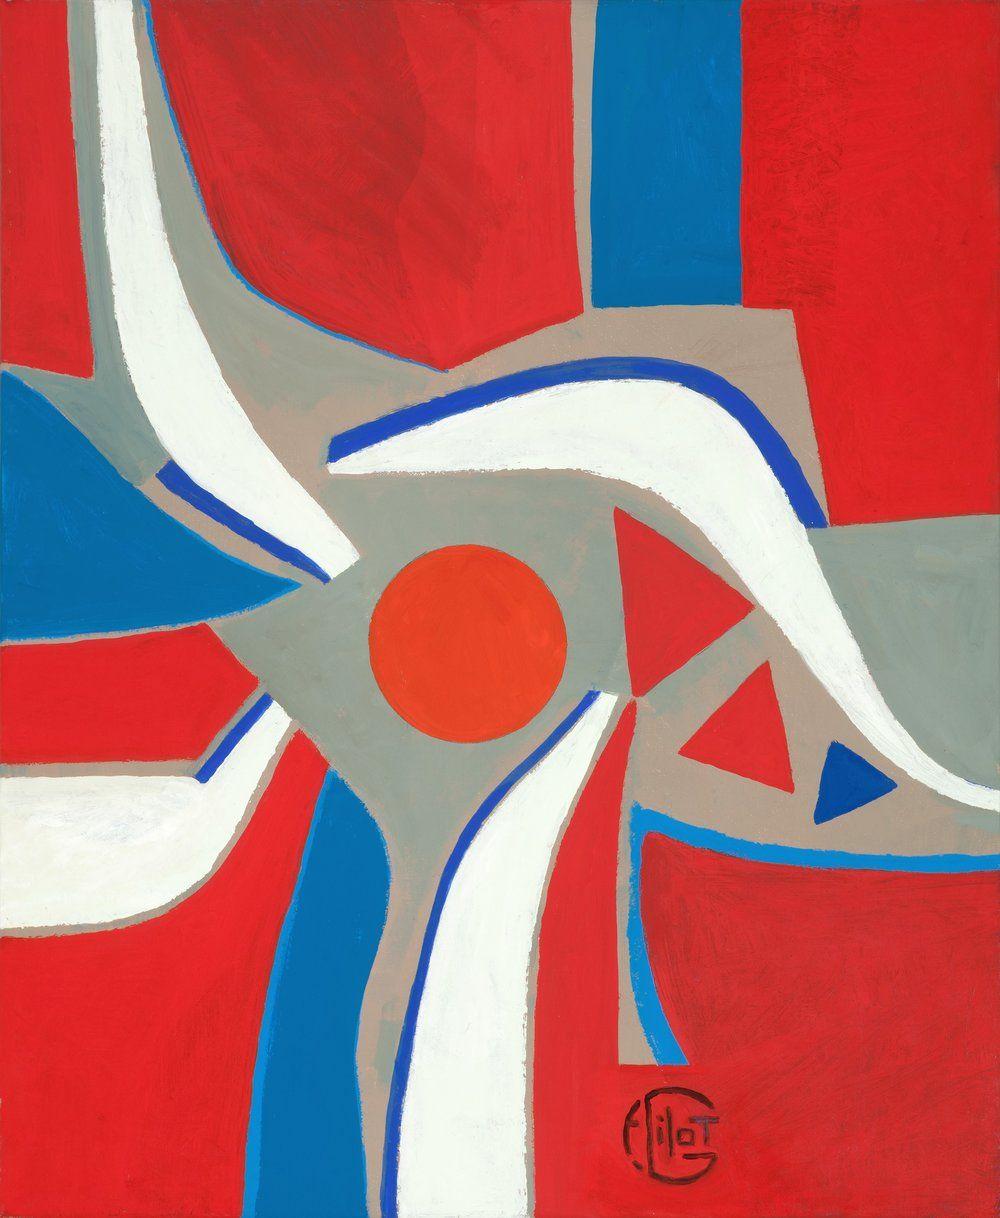 'Fiesta' (2008) by Françoise Gilot Graphic design